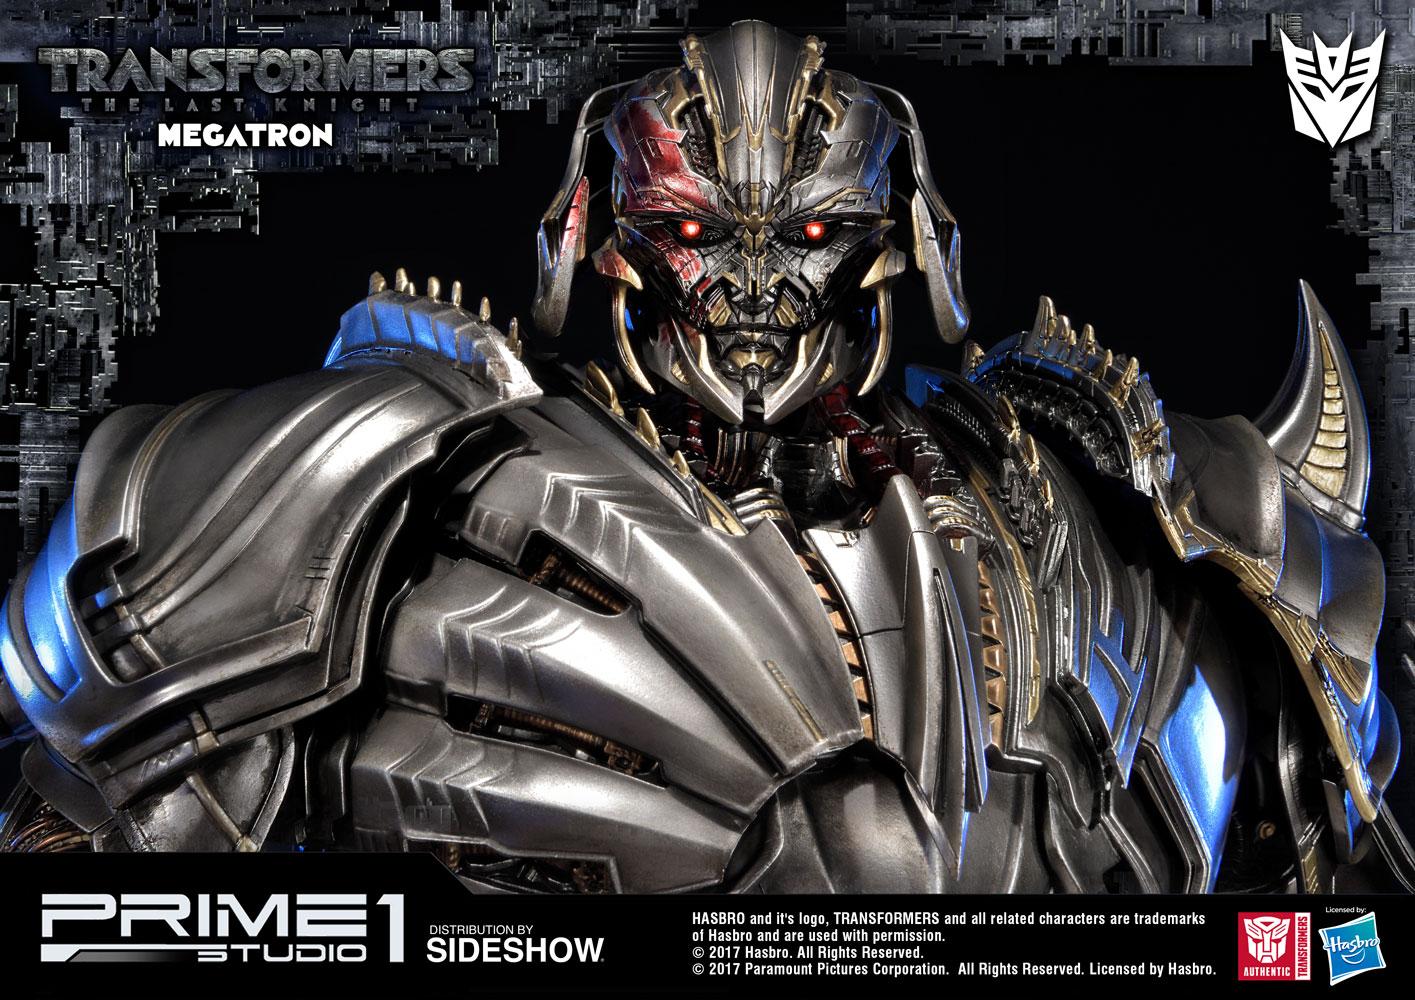 transformers megatron statueprime 1 studio | sideshow collectibles